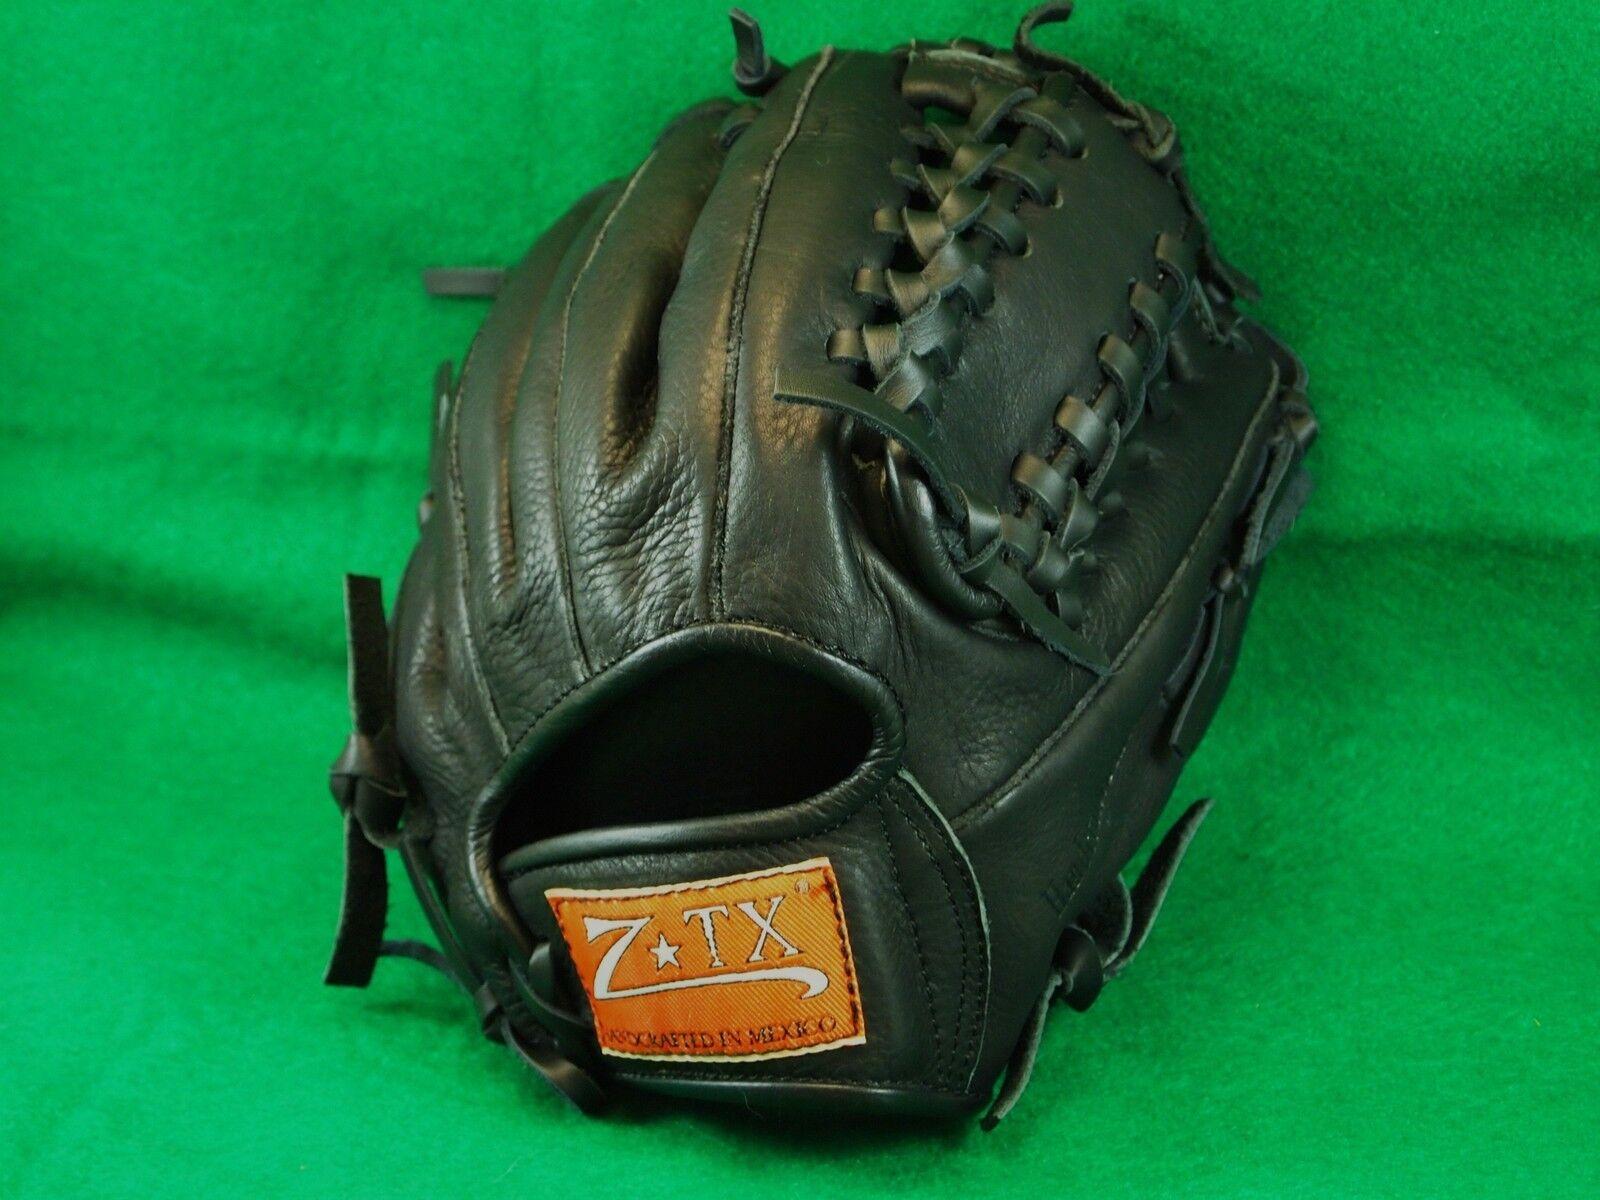 Guante de béisbol (1085) Modelo Z-TX 11.25  De Cuero Negro